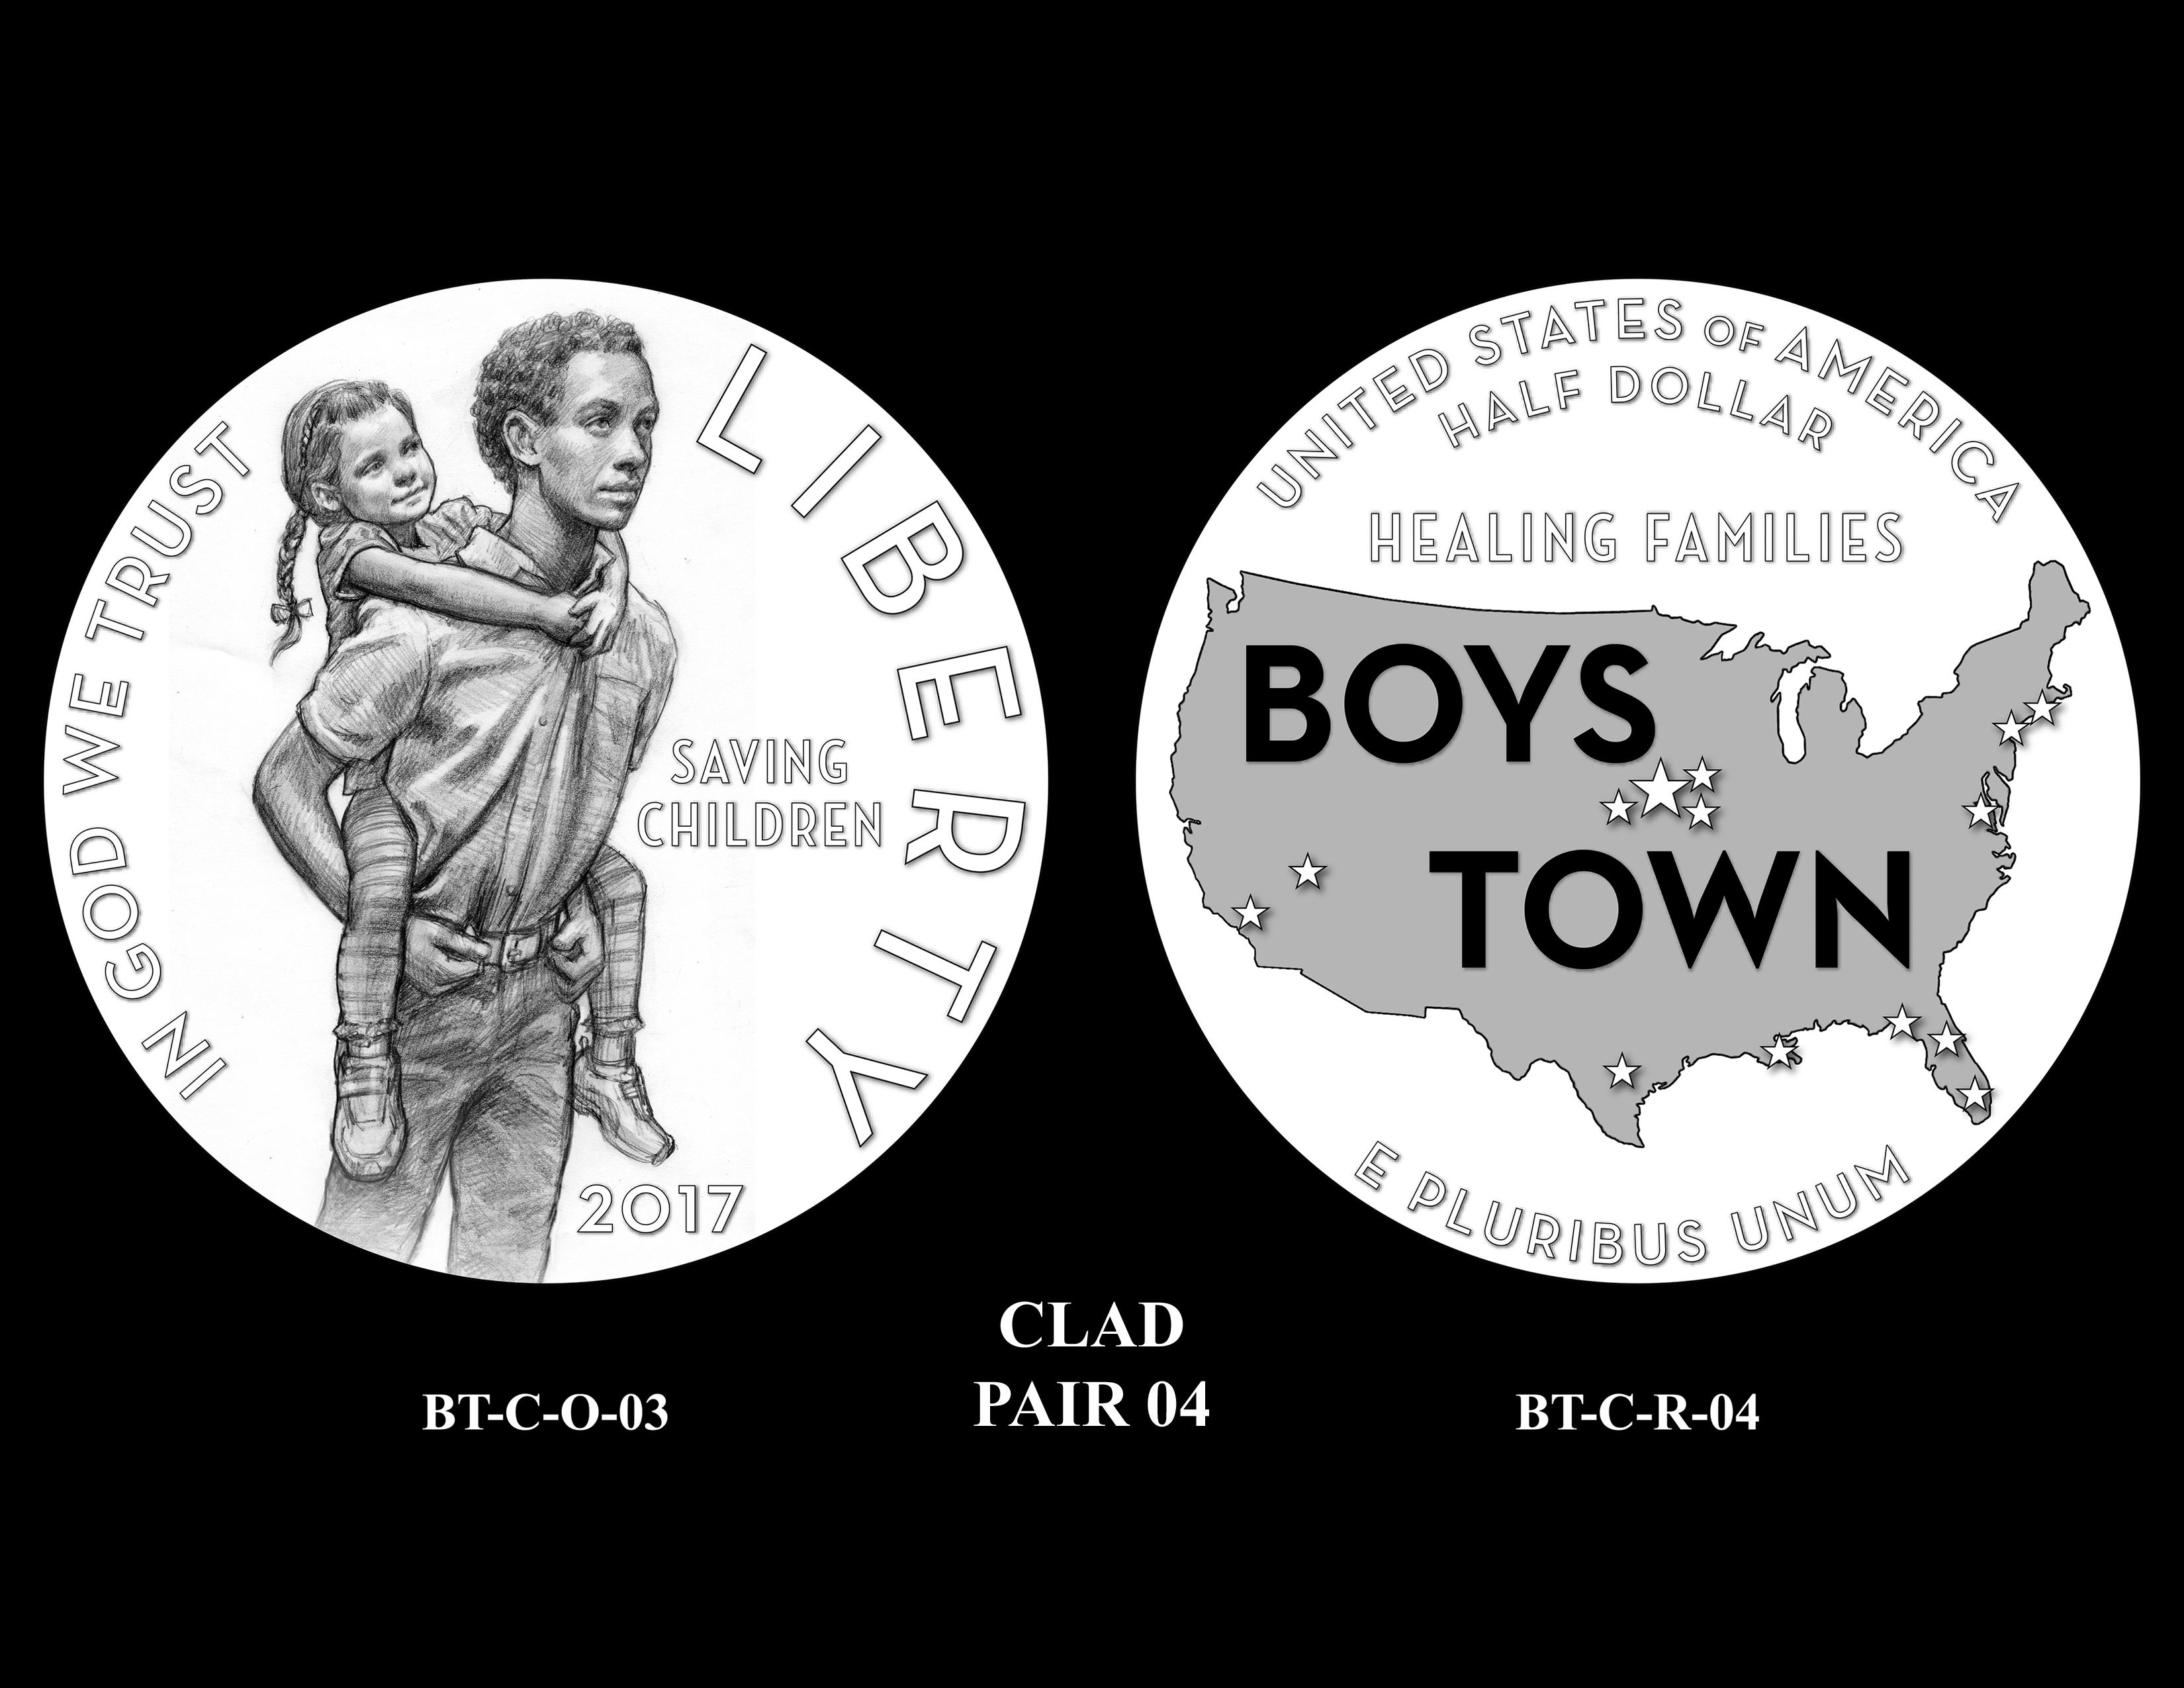 Clad-Pair-04 -- 2017 Boystown Centennial Commemorative Coin  Program